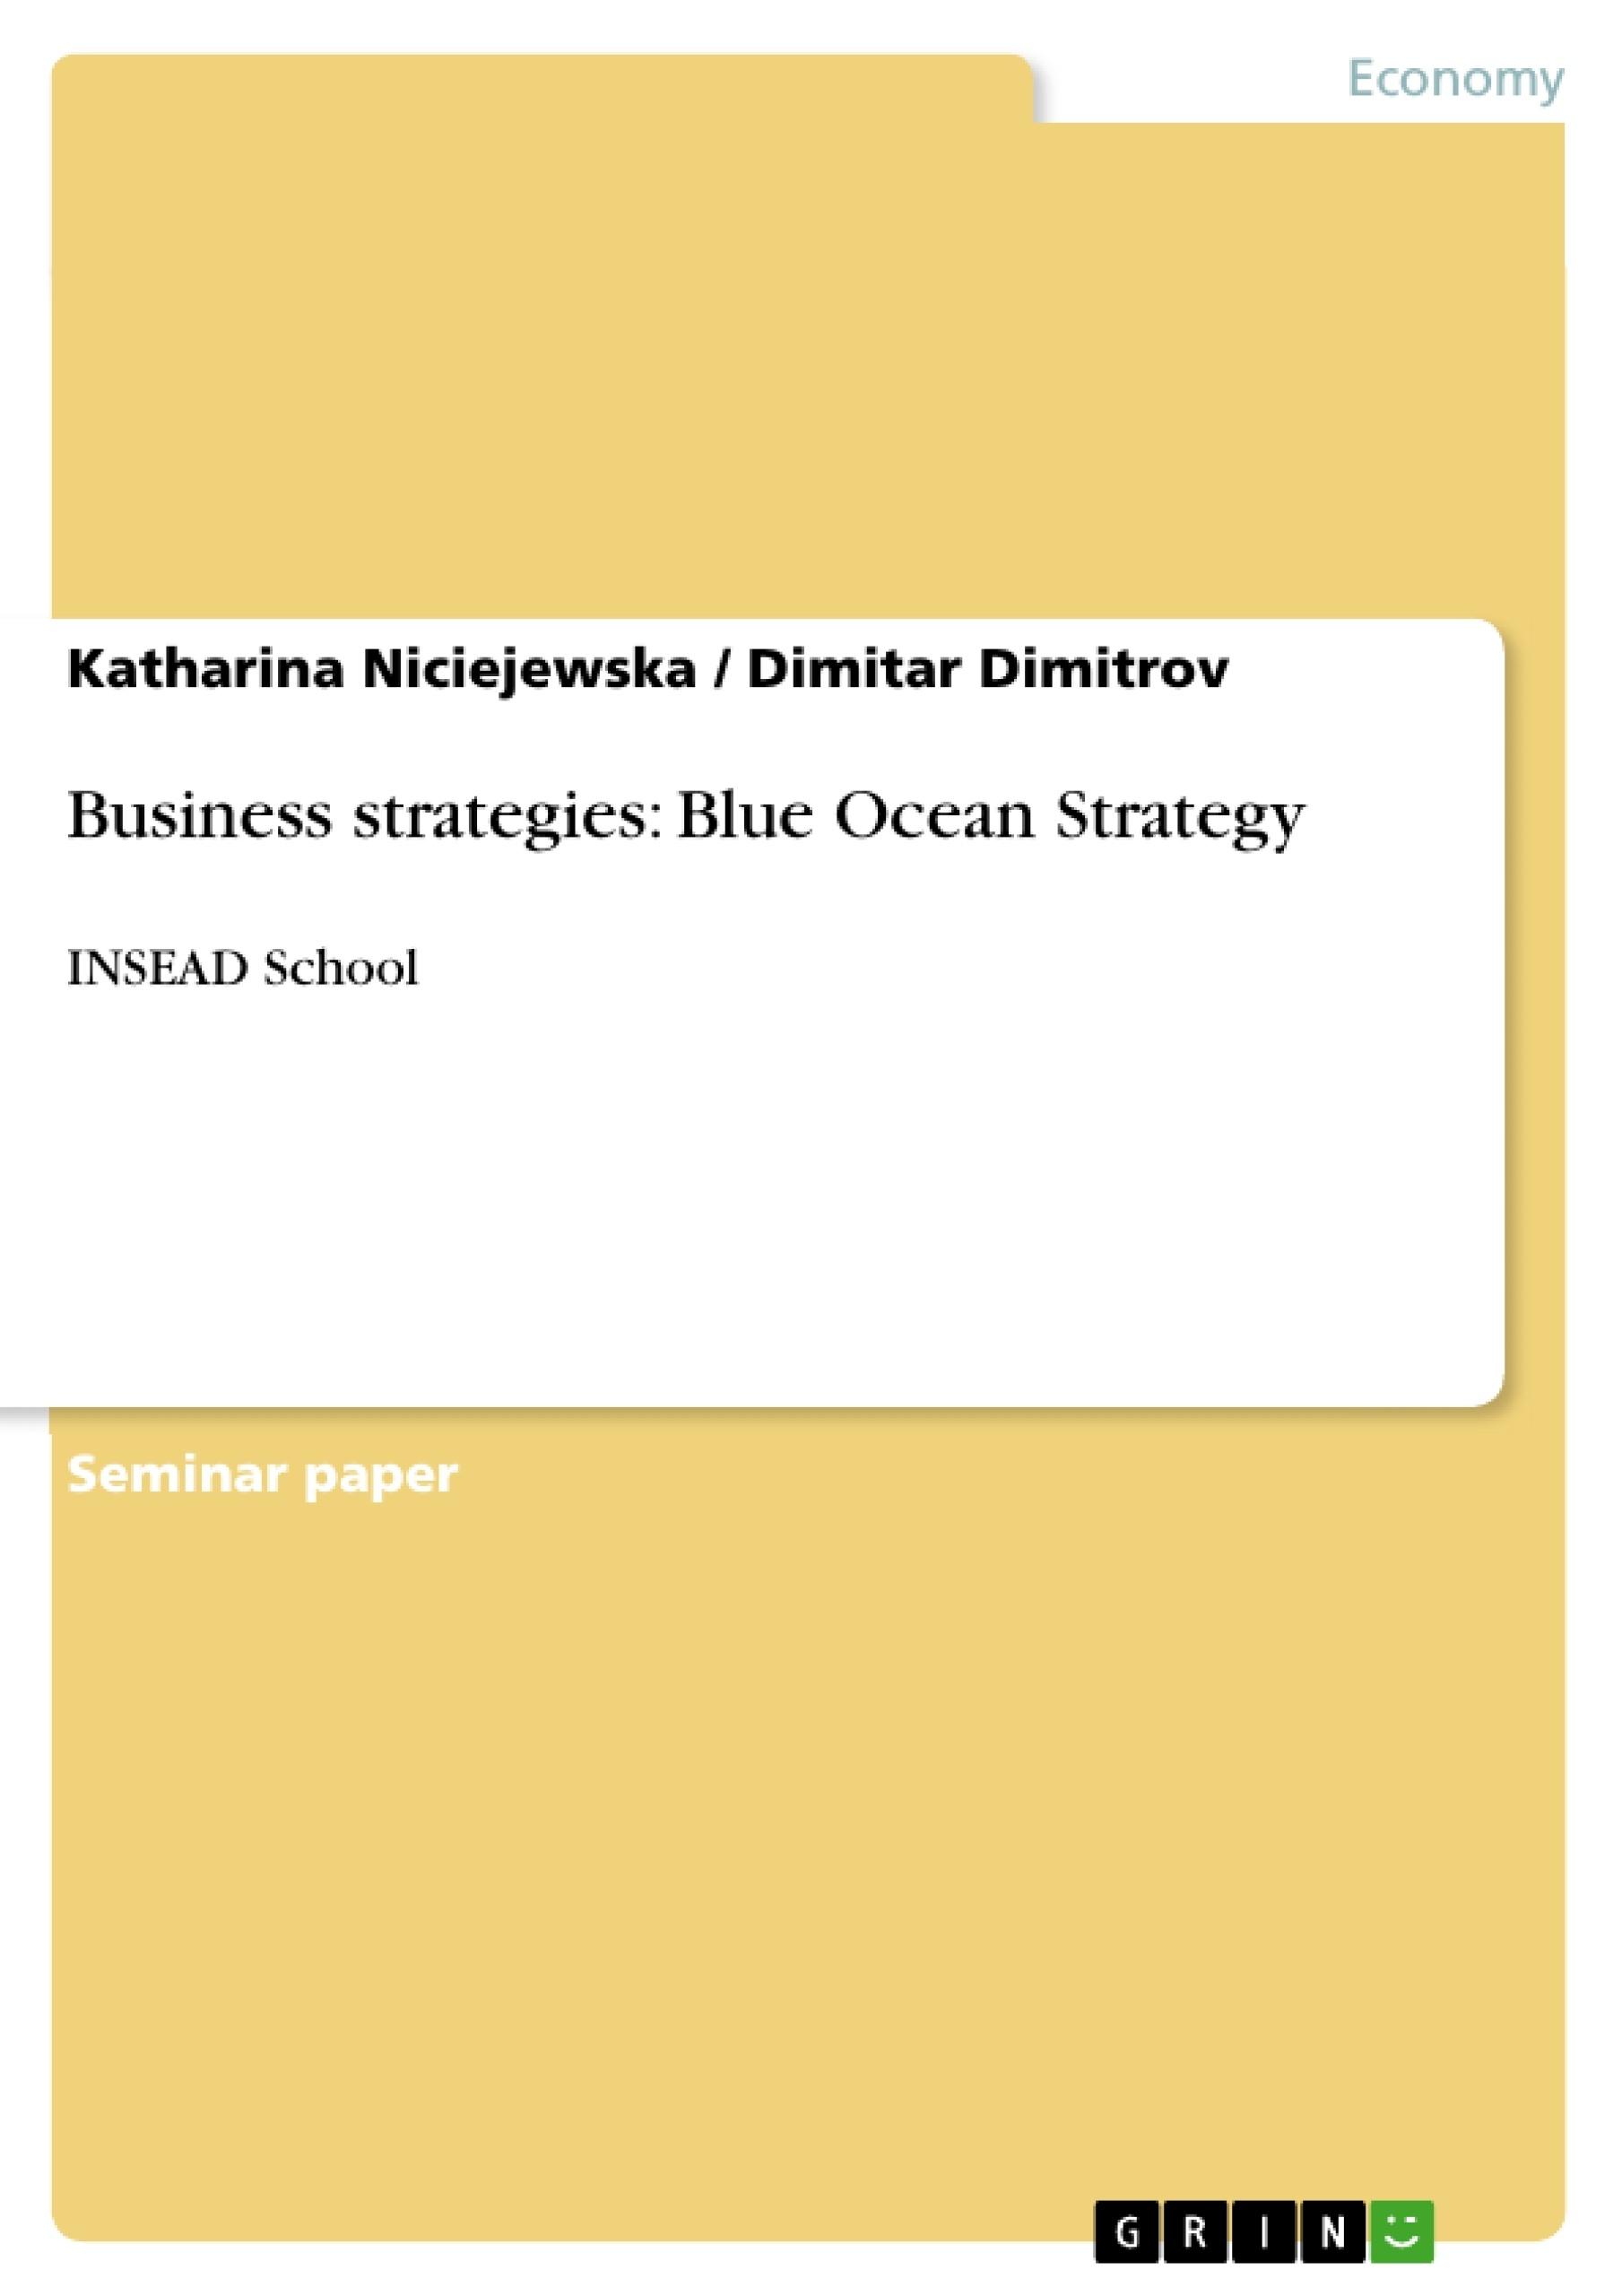 Title: Business strategies: Blue Ocean Strategy